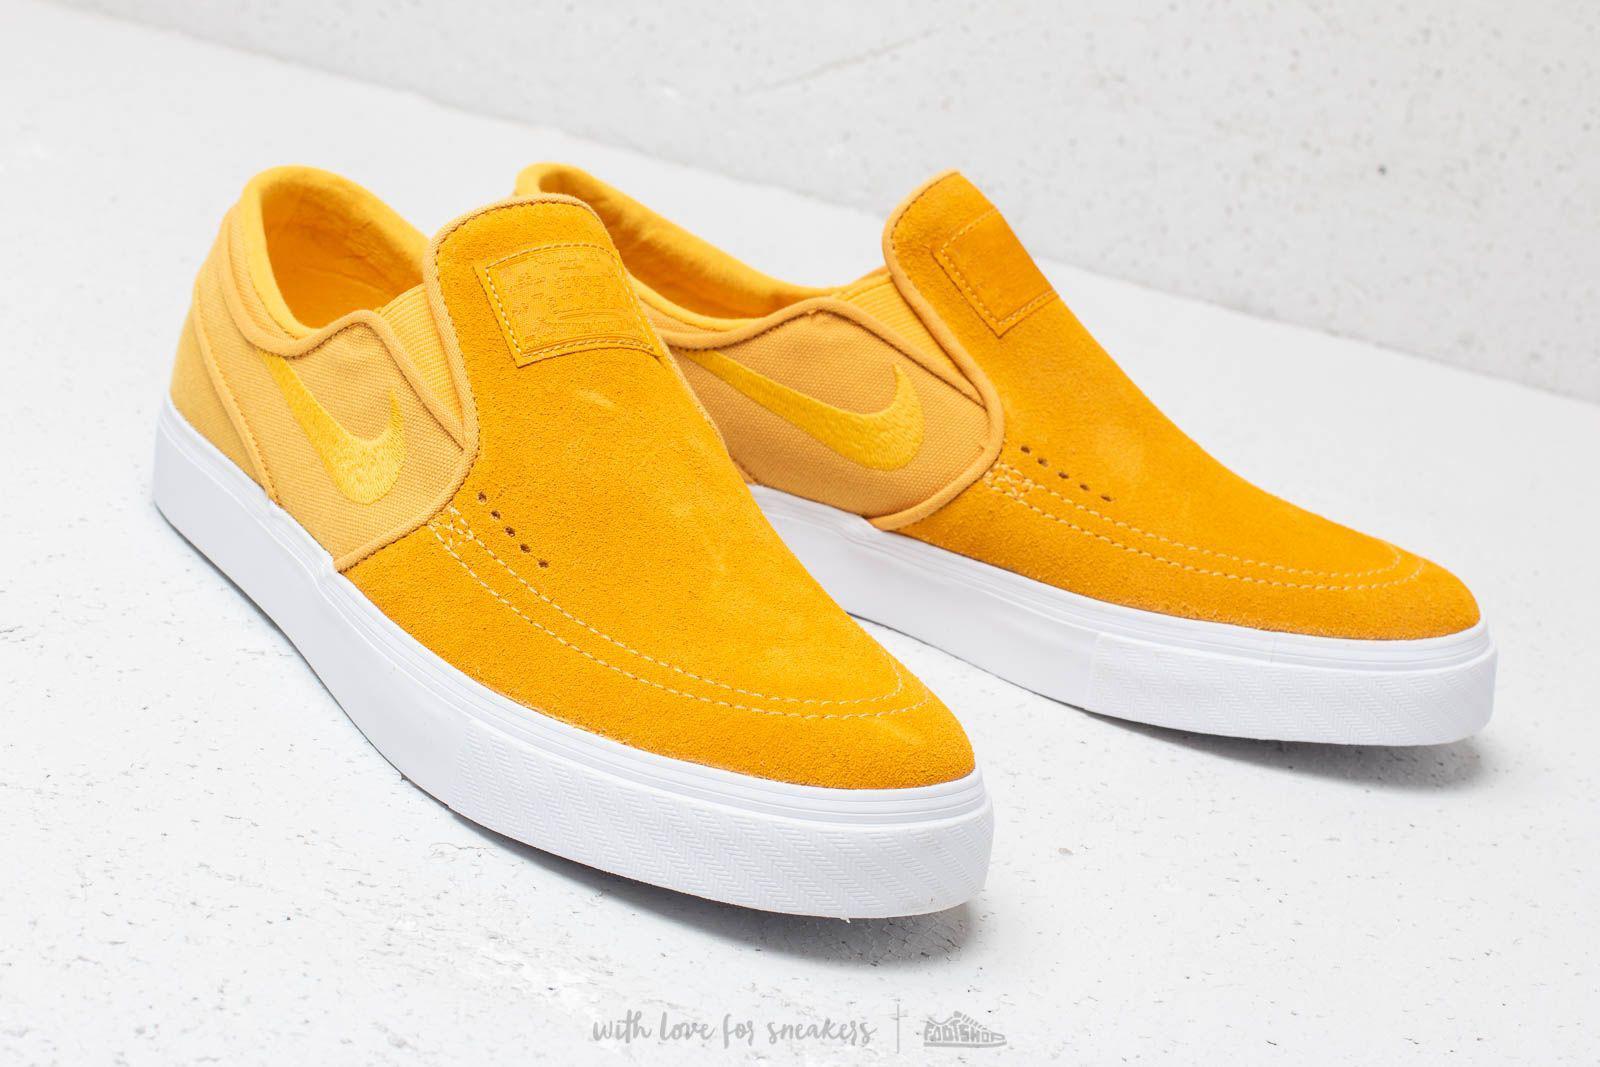 f37f278a2ecb8 Lyst - Nike Zoom Stefan Janoski Slip Yellow Ochre  Yellow Ochre ...